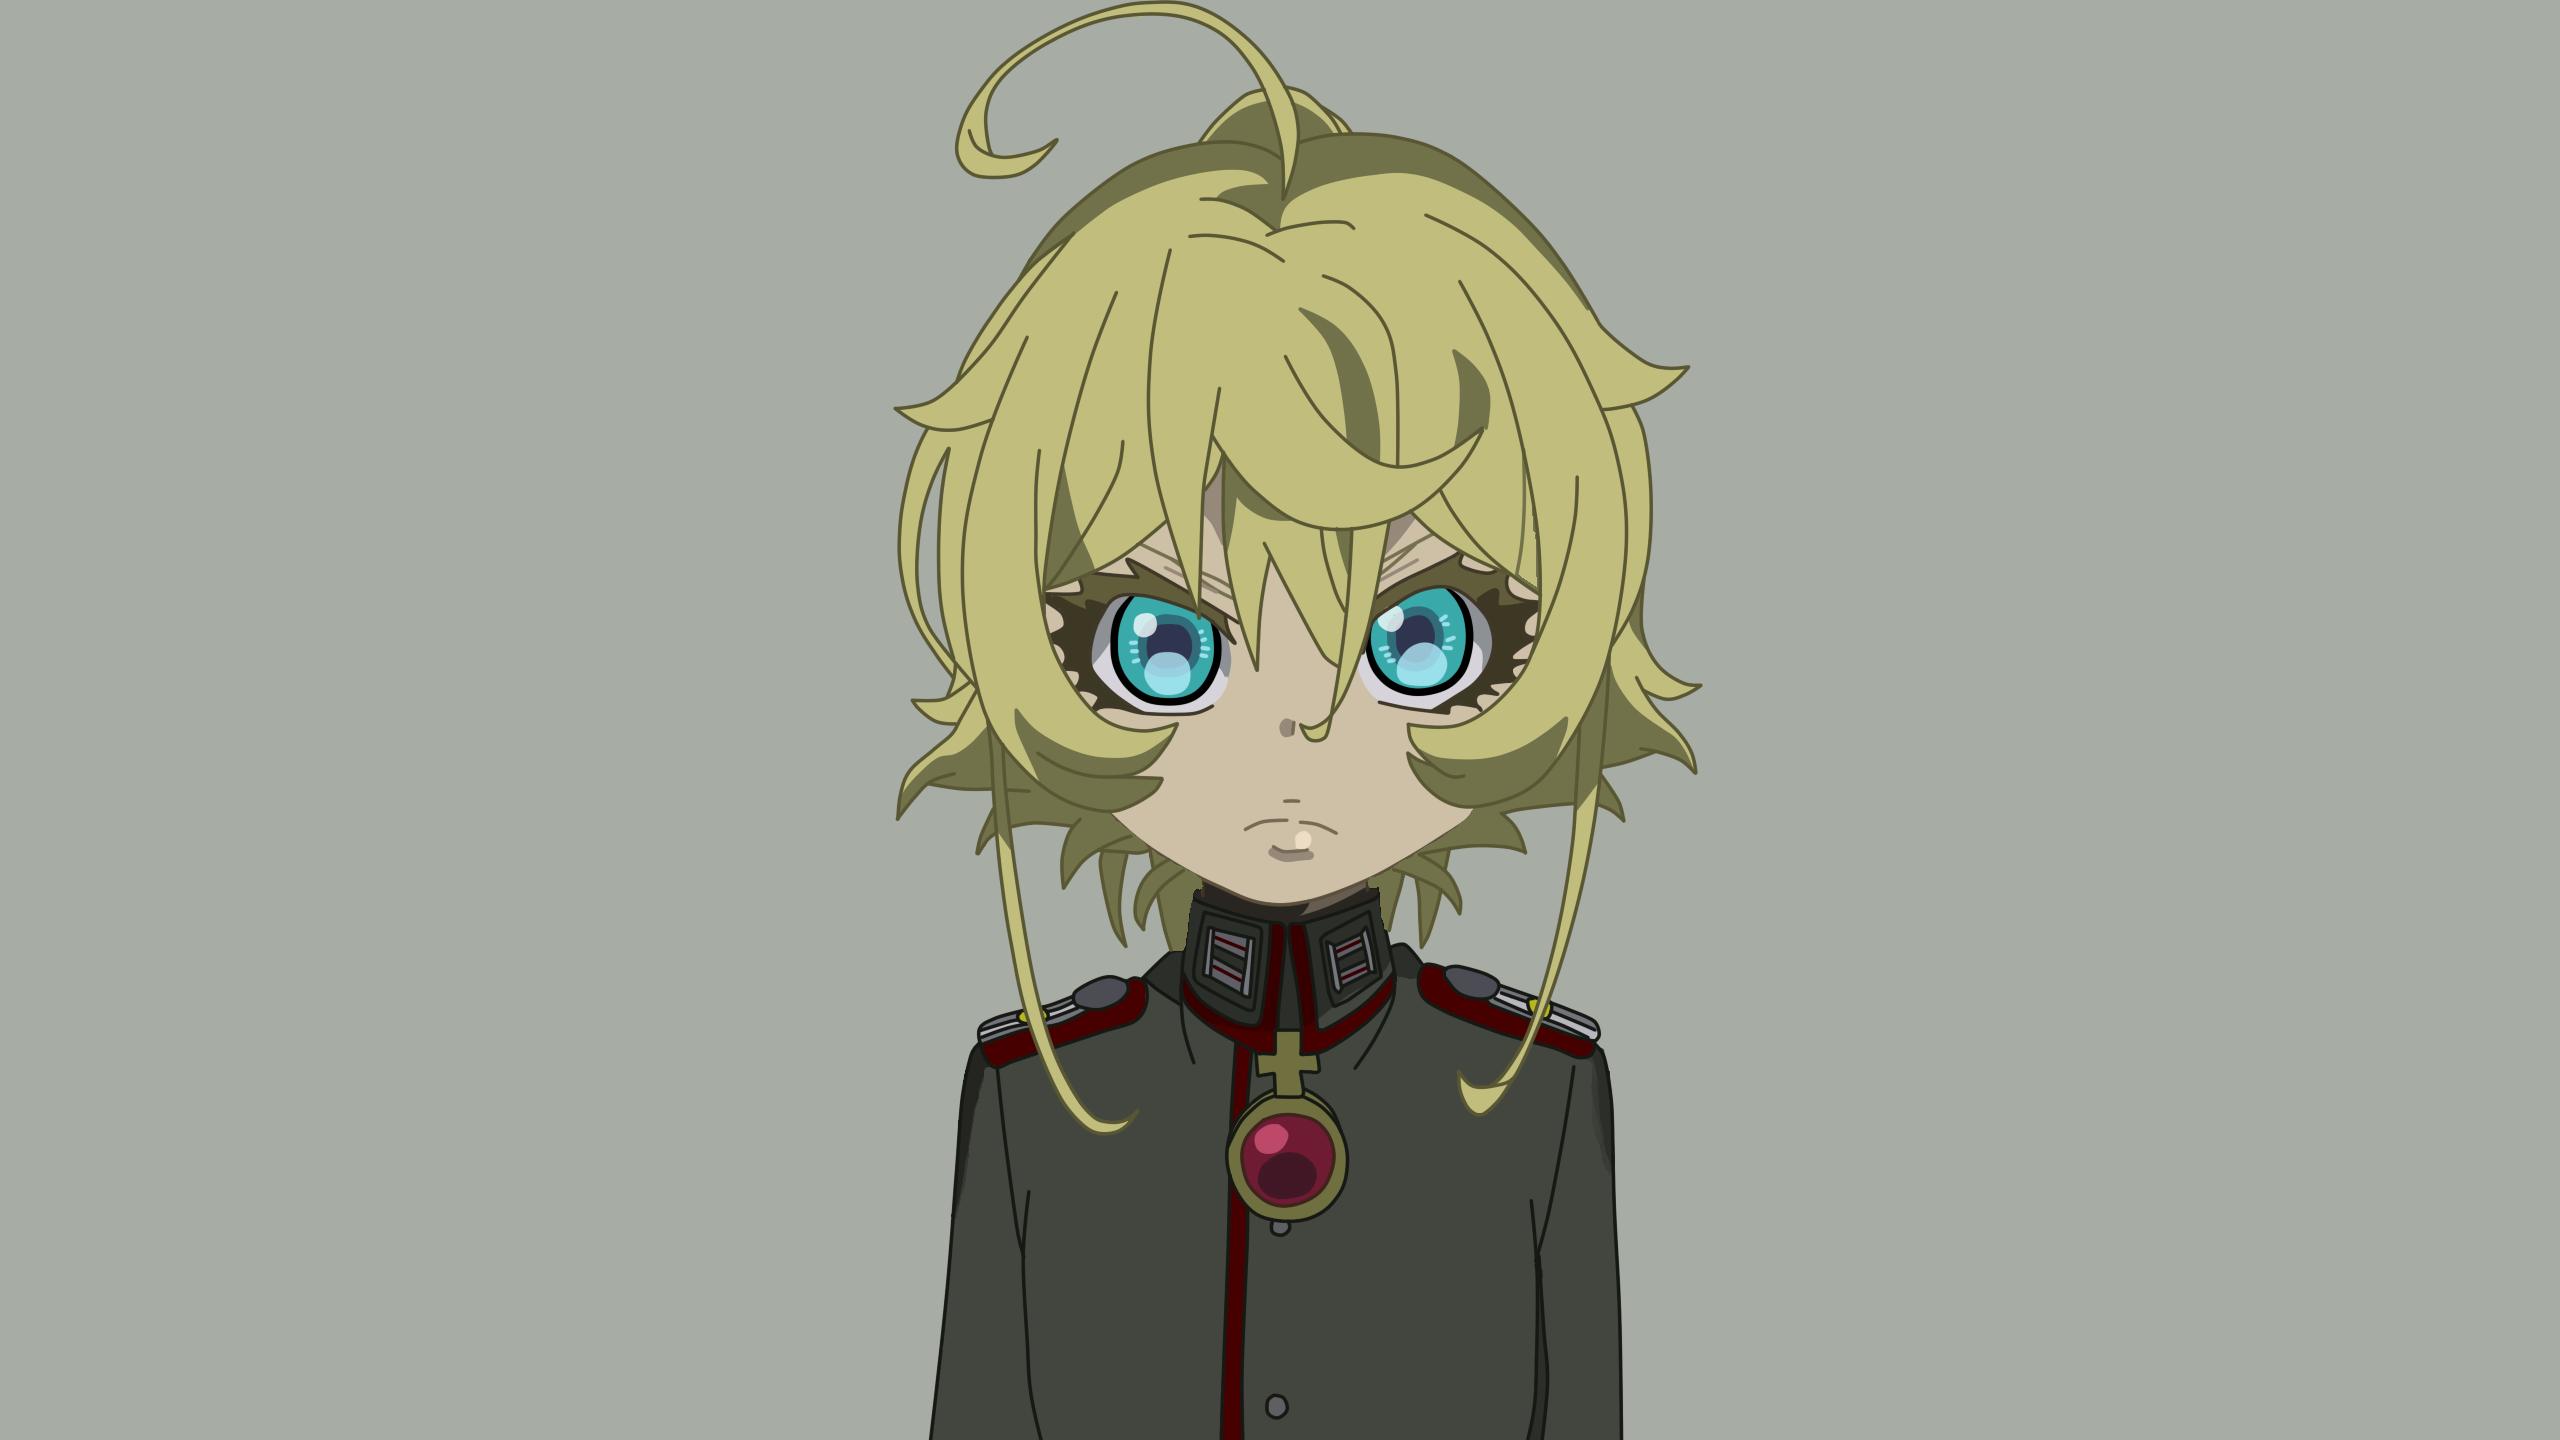 Anime 2560x1440 Youjo Senki Tanya Degurechaff anime girls anime simple background blue eyes